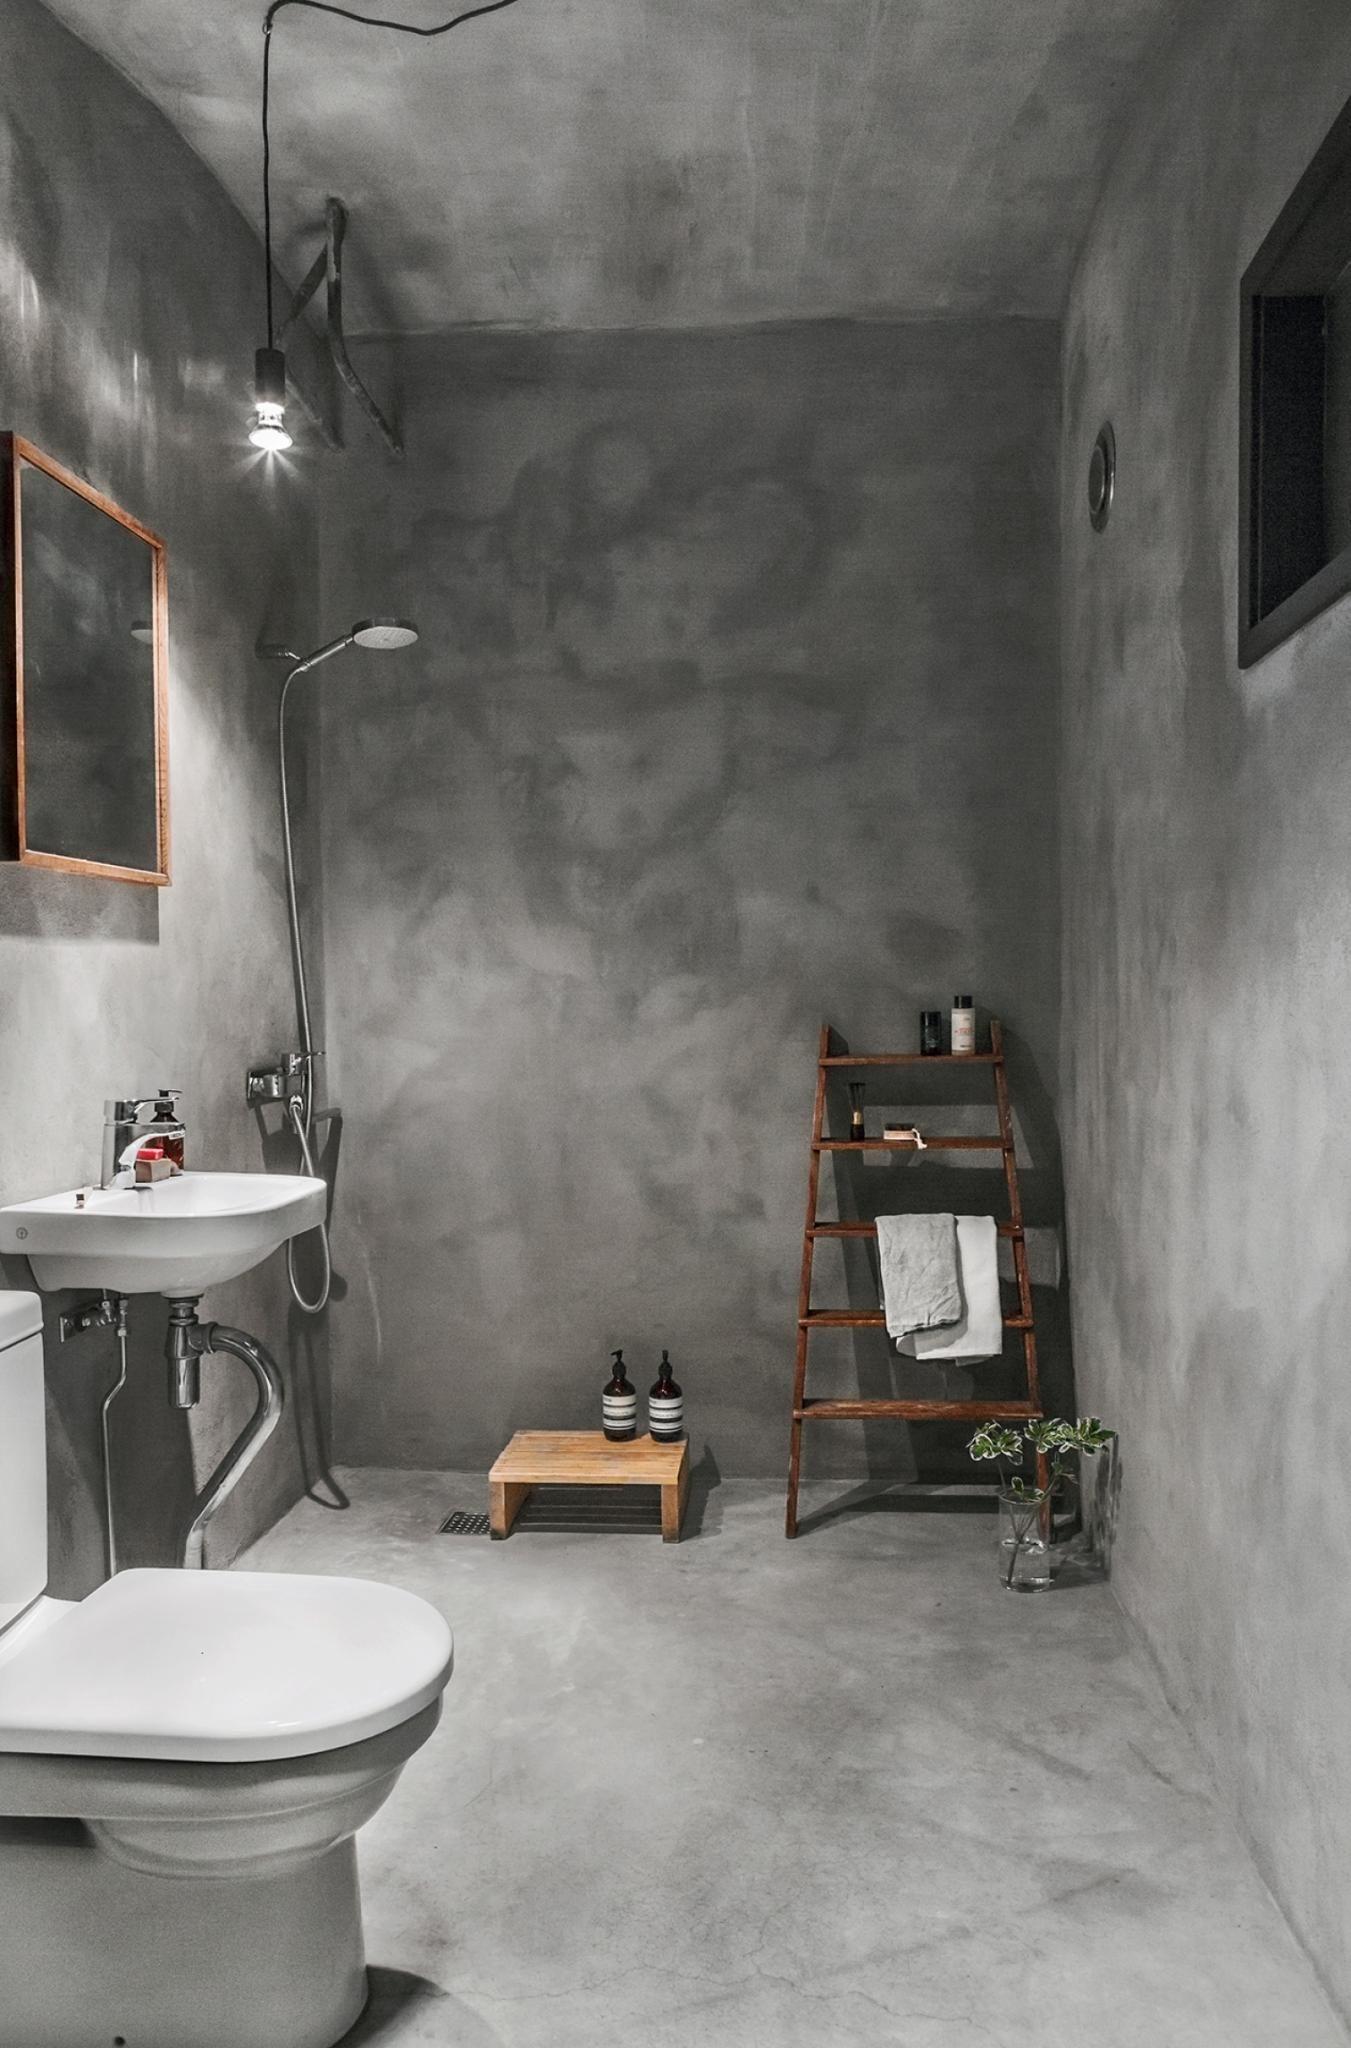 extraordinary concrete bathroom ideas | Concrete bathroom | Concrete bathroom, Bathroom interior ...